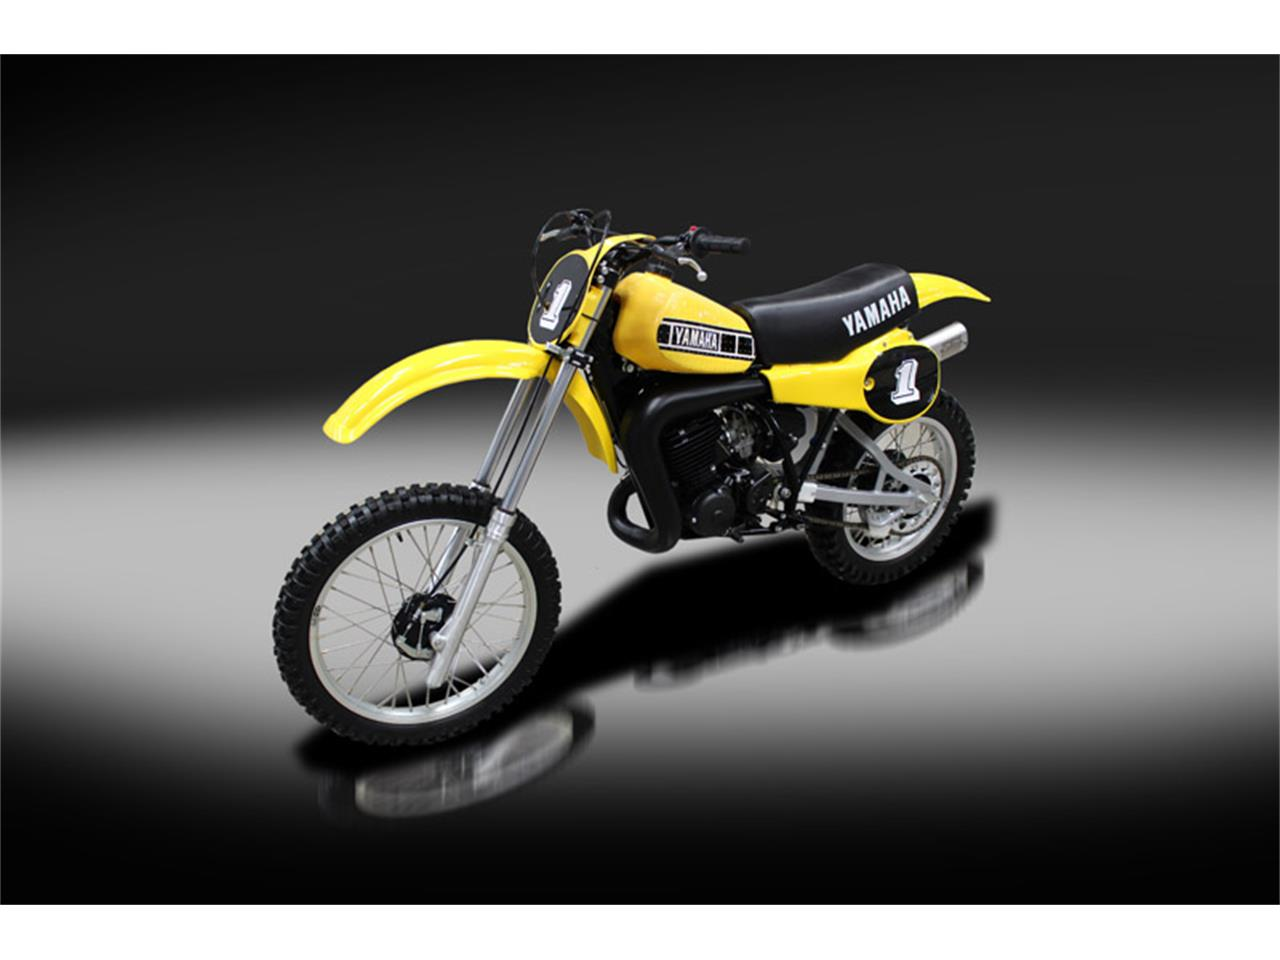 Motorcycle Parts Suzuki Jr50 New White Plate With Black Background Vintage Motocross Vehicle Parts Accessories Visitestartit Com